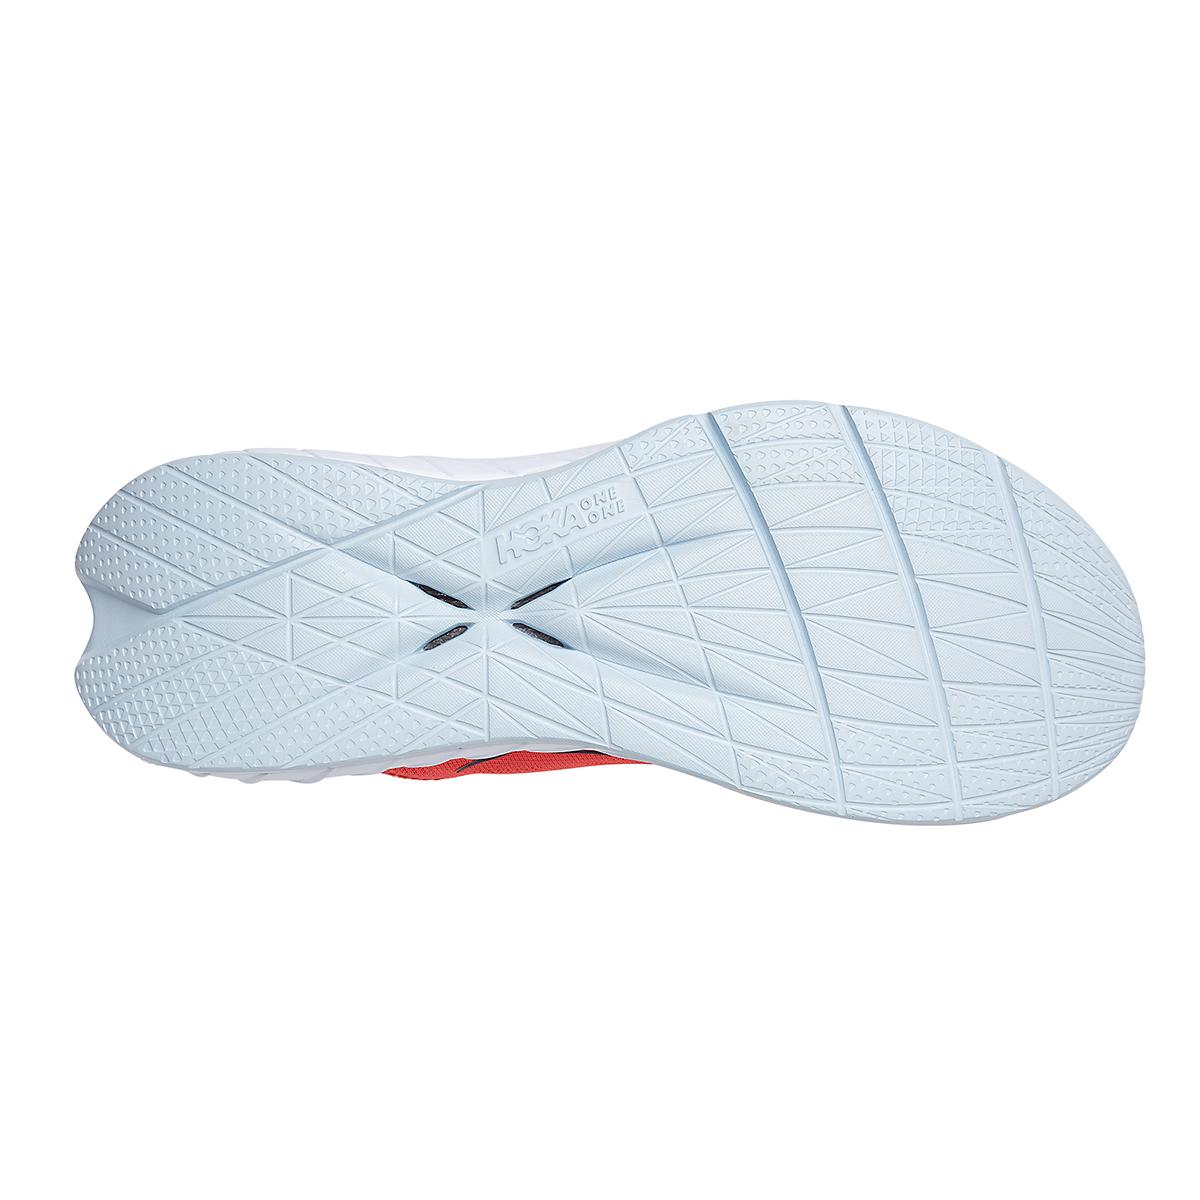 Women's Hoka One One Carbon X 2 Running Shoe - Color: Hot Coral/Black Iris - Size: 5 - Width: Regular, Hot Coral/Black Iris, large, image 6